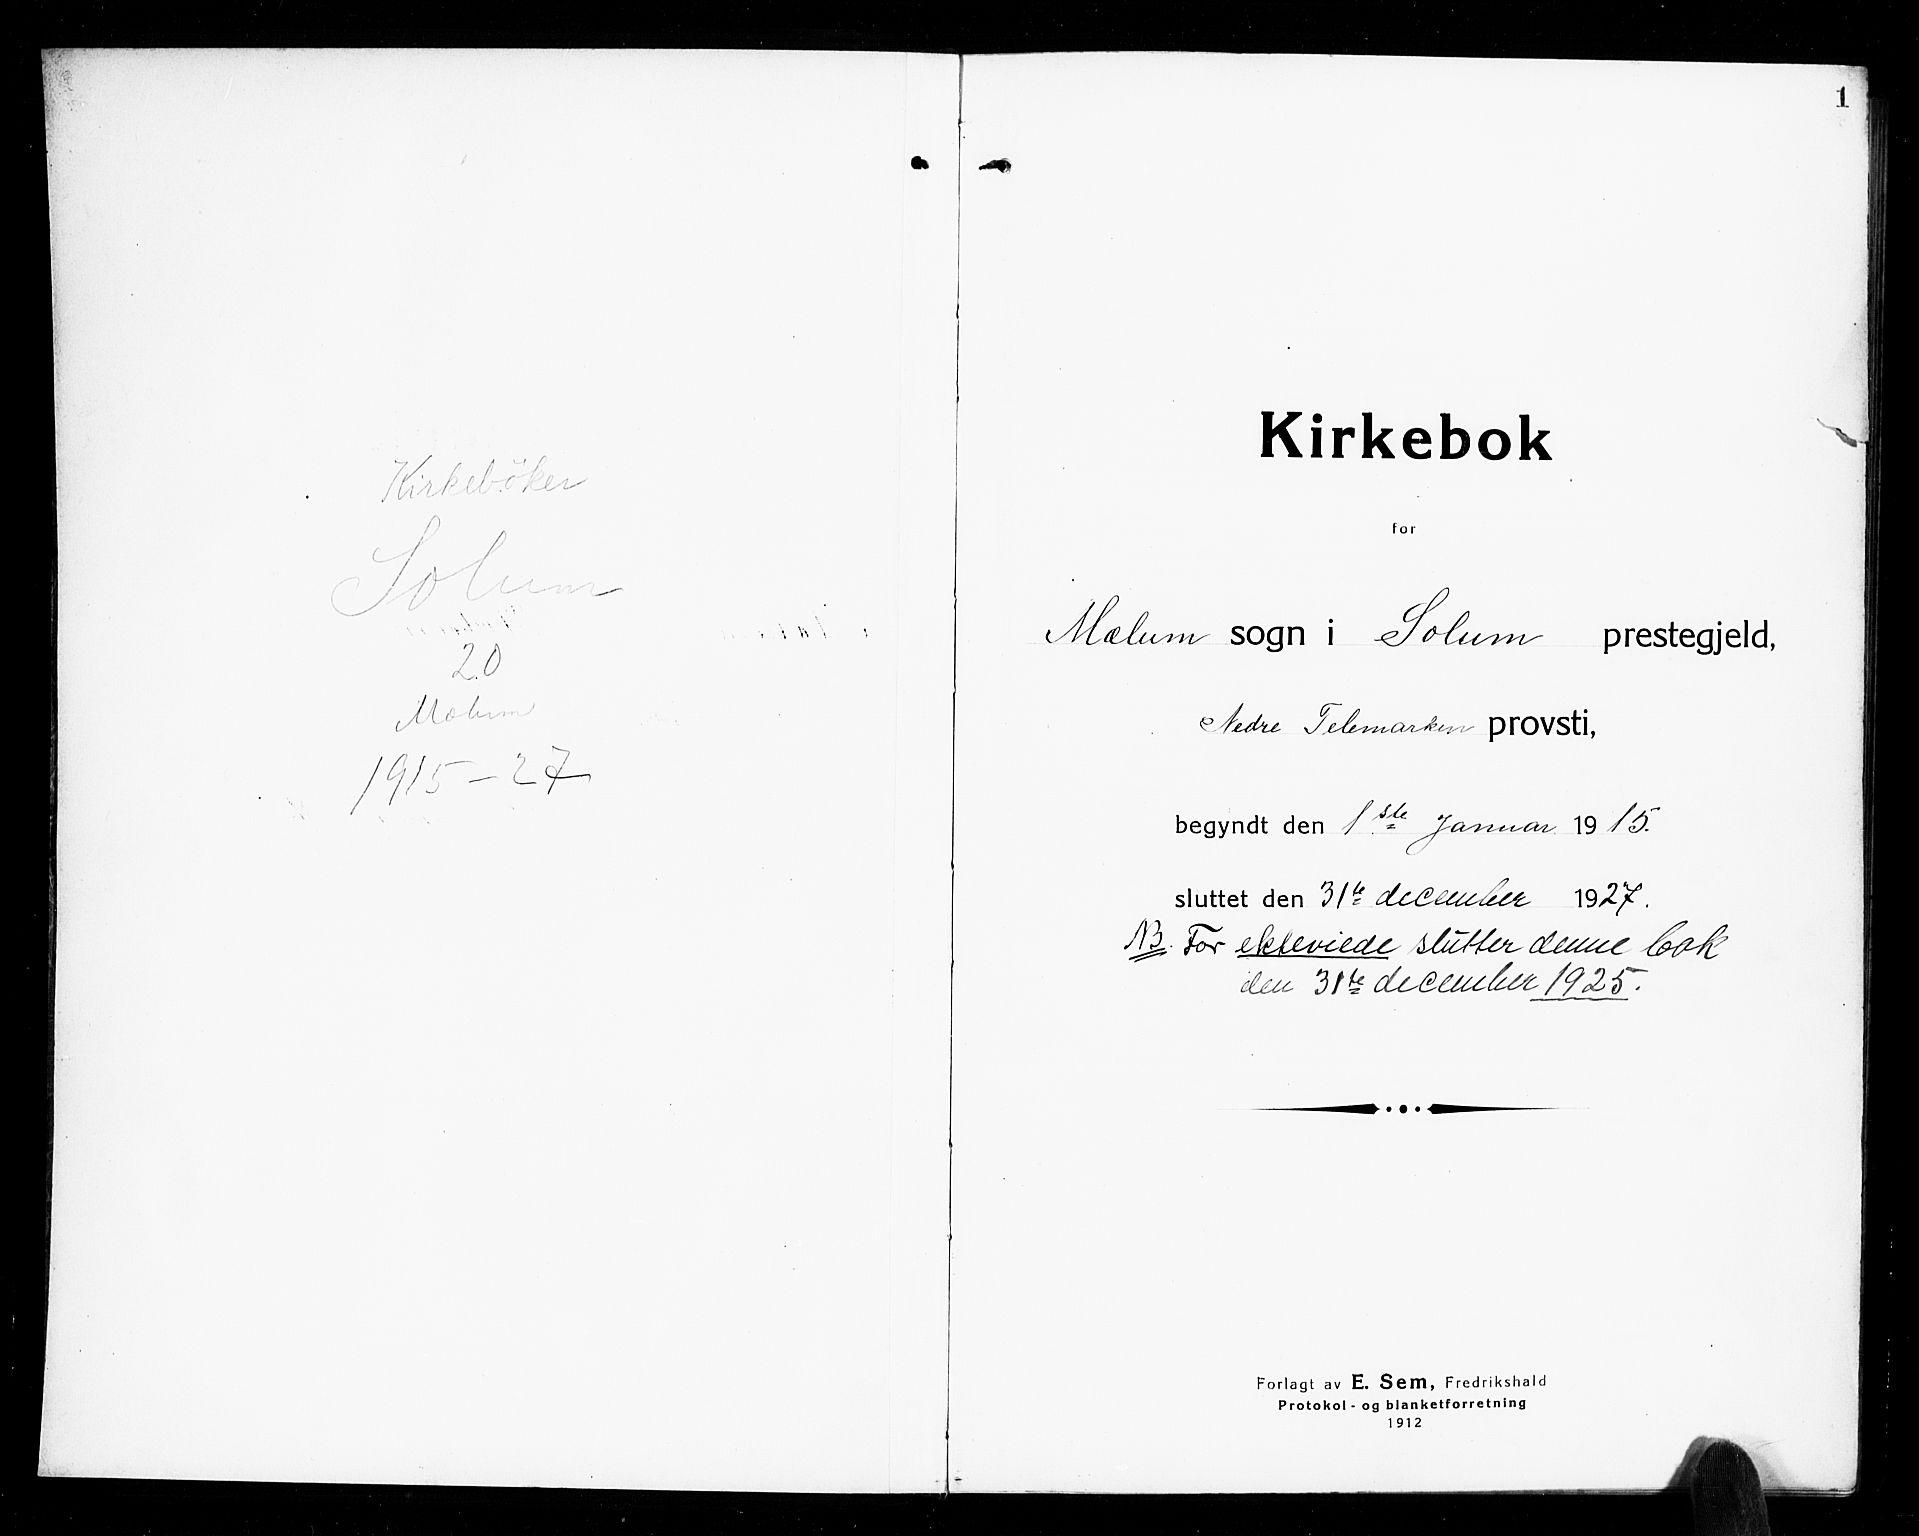 SAKO, Solum kirkebøker, G/Gb/L0006: Klokkerbok nr. II 6, 1915-1927, s. 1